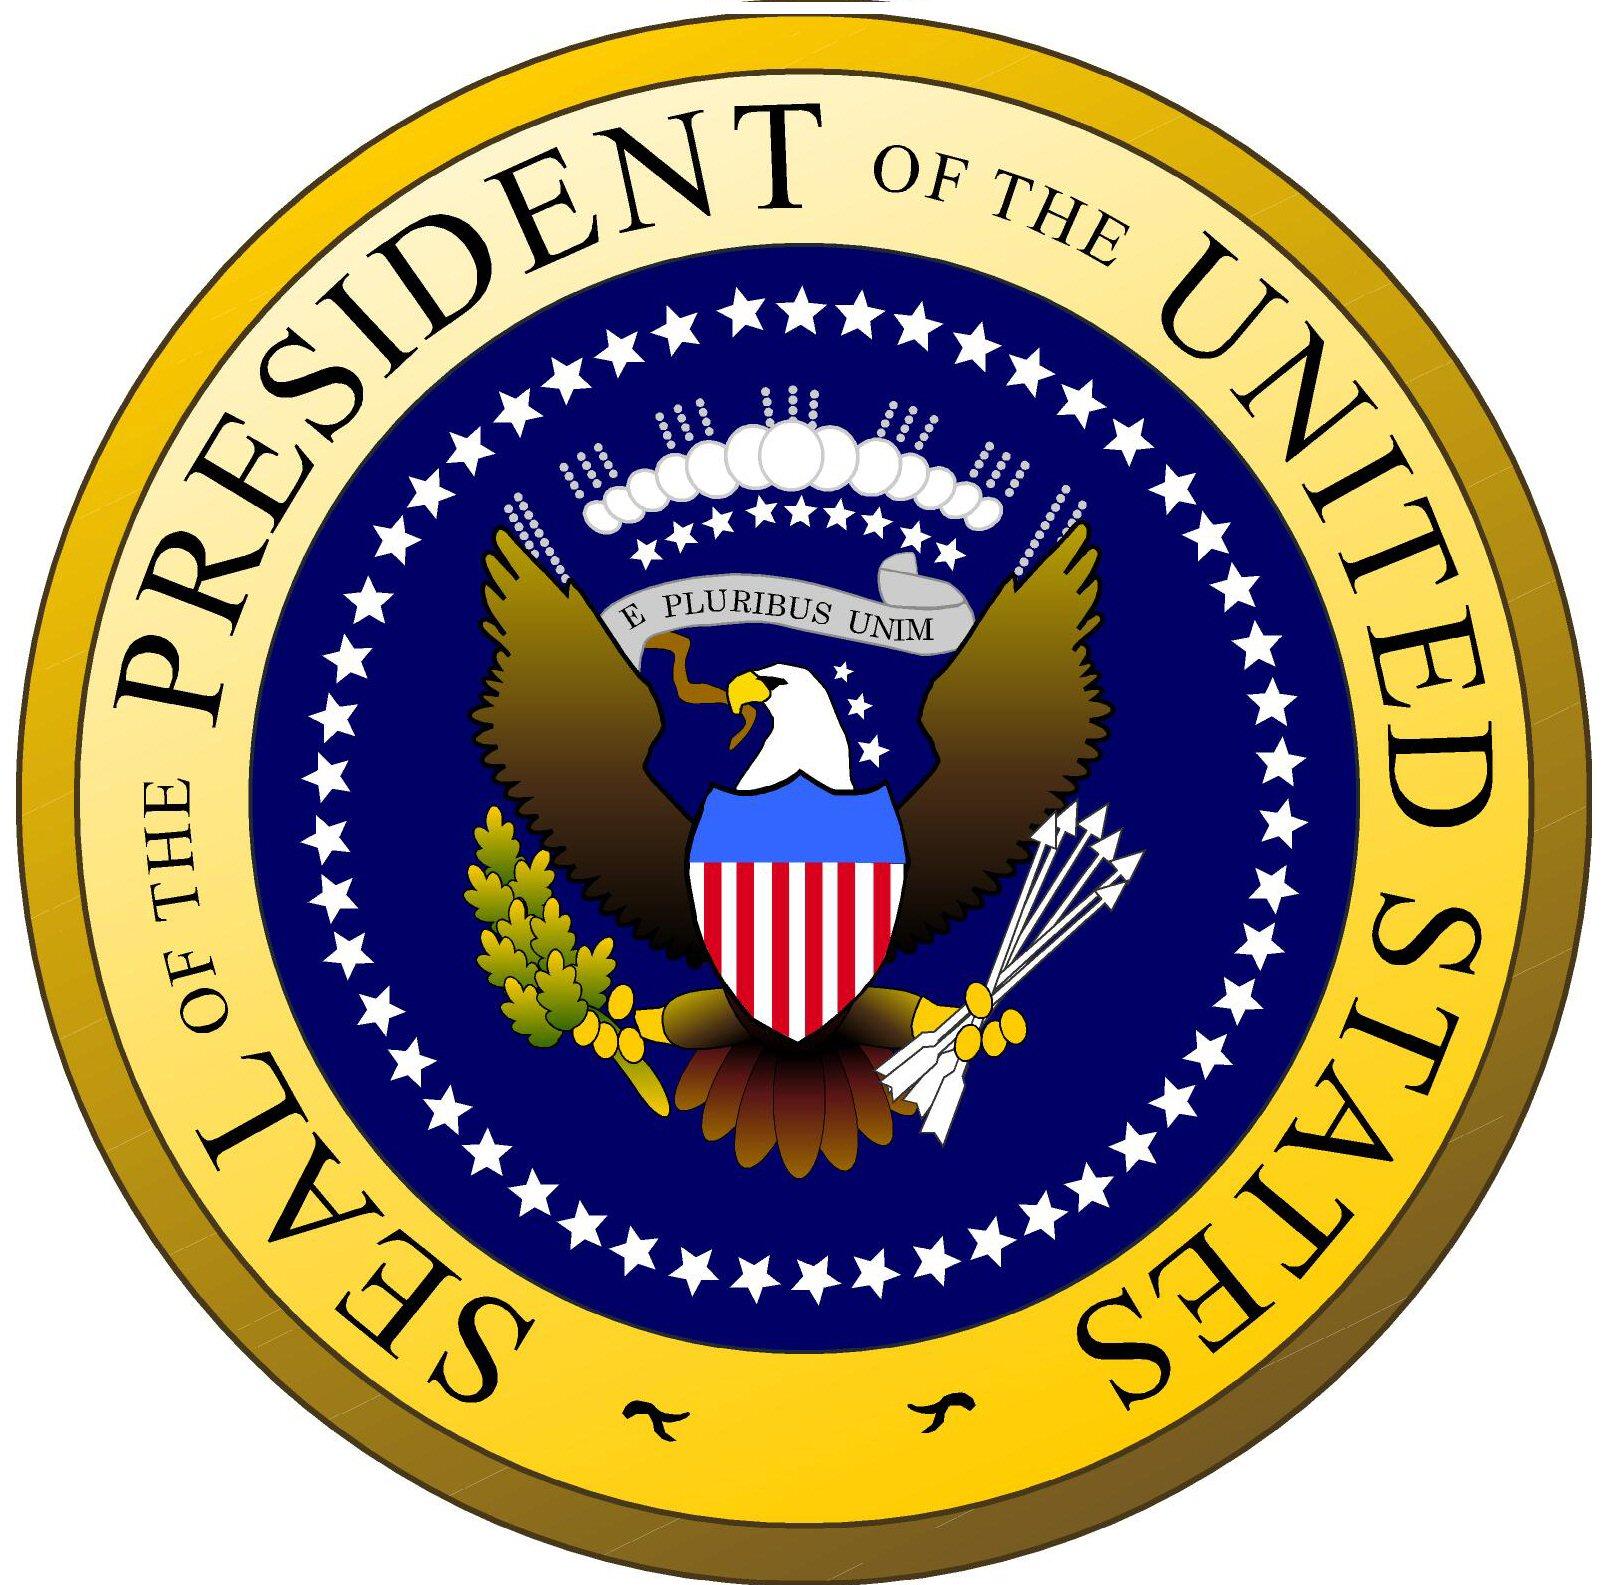 United States Government. (2010, January 27). Presidential Seal [Digital image]. Retrieved from http://www.martyduren.com/wp-content/uploads/2010/01/PresidentialSeal.jpg